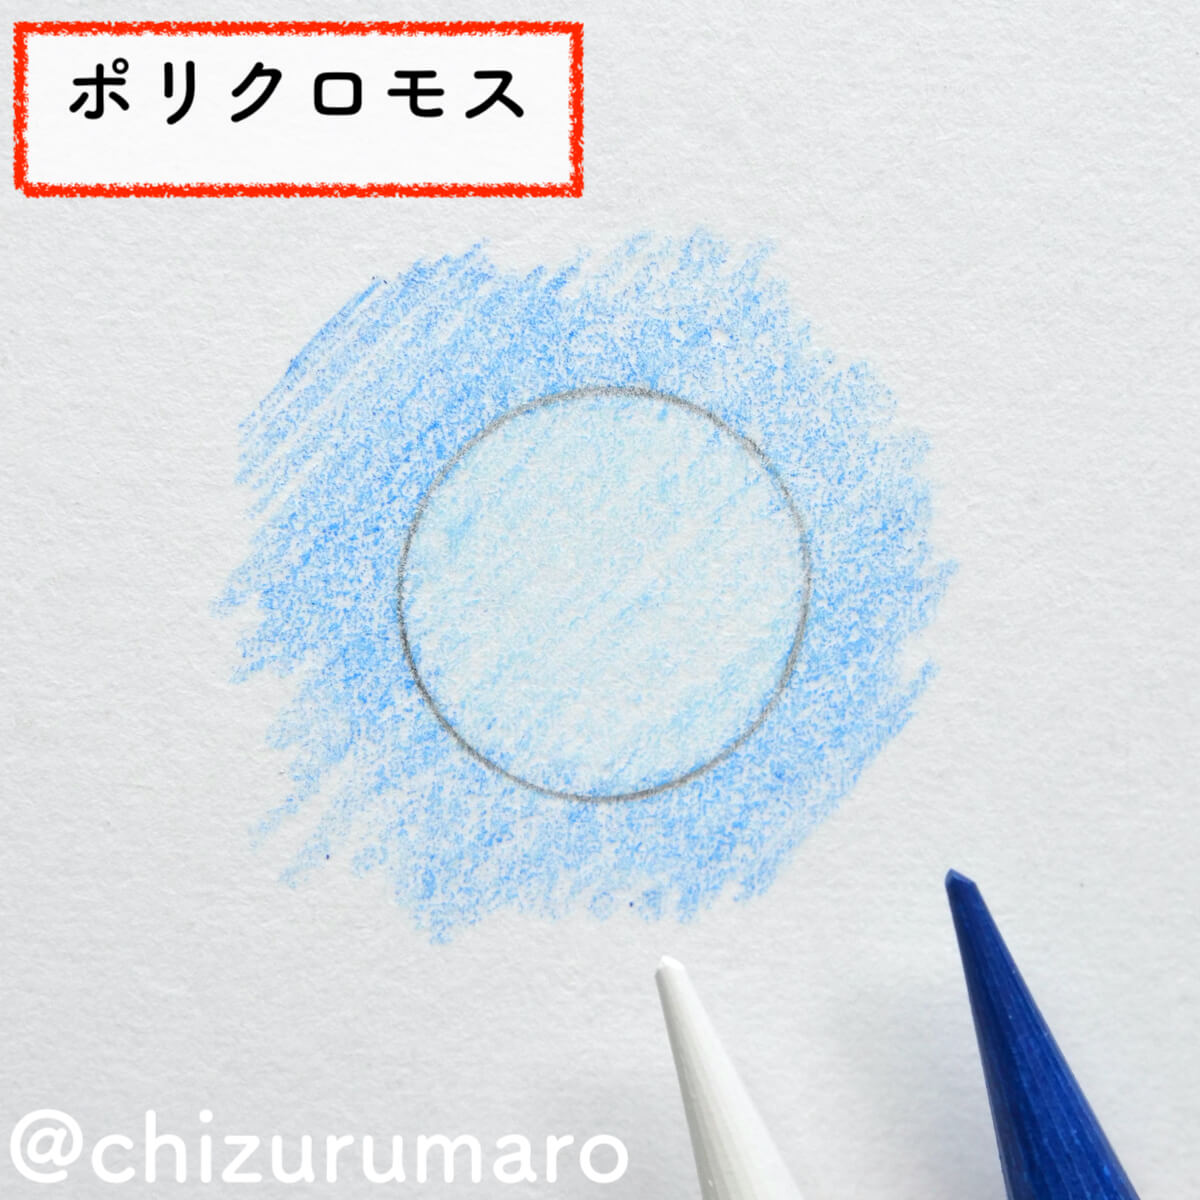 f:id:chizurumaro:20210812222954j:plain